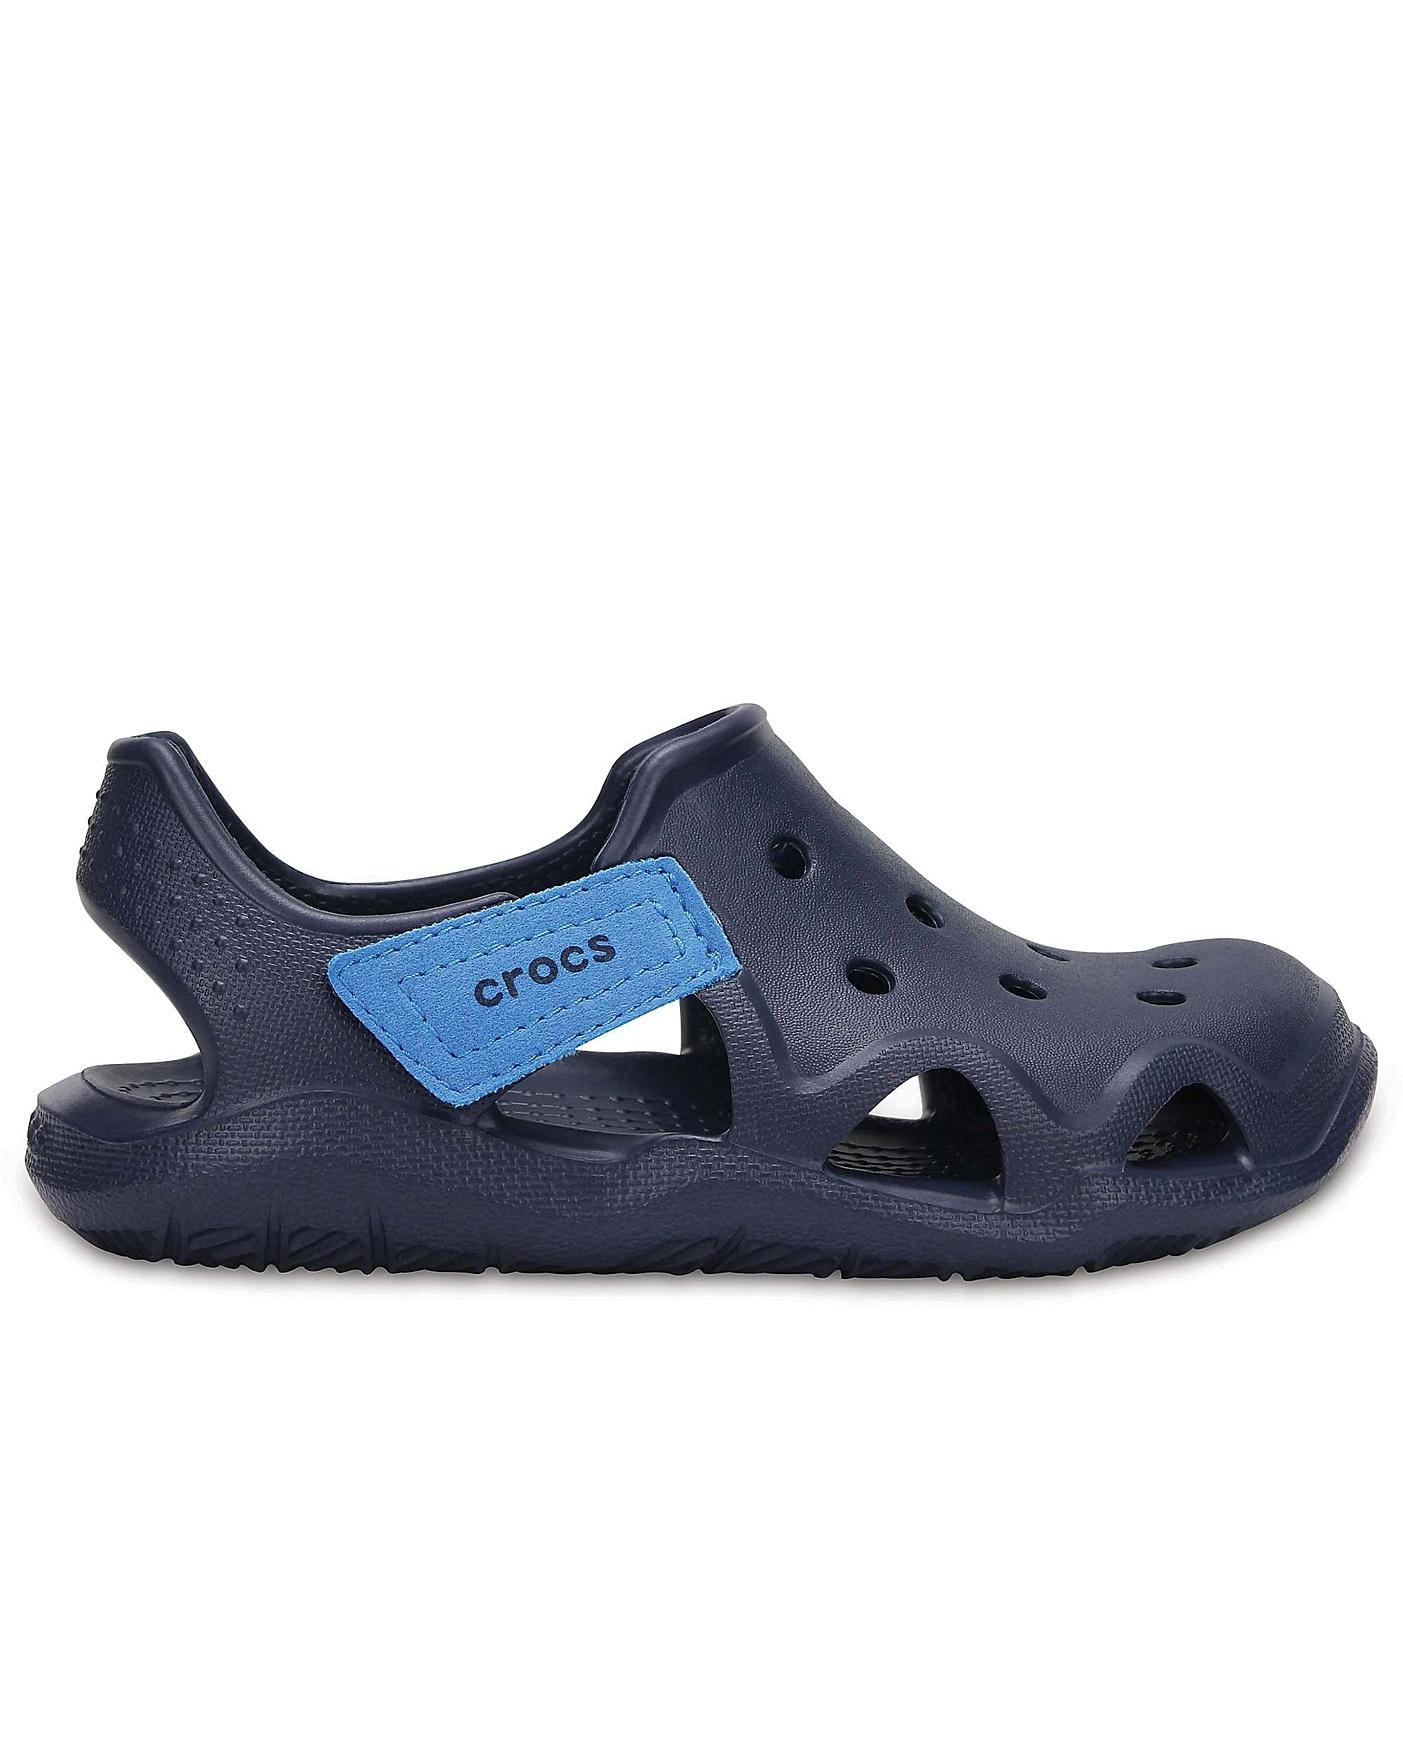 Crocs Kids Swiftwater Wave Sandal Ocean Blue Children/'s Size 13